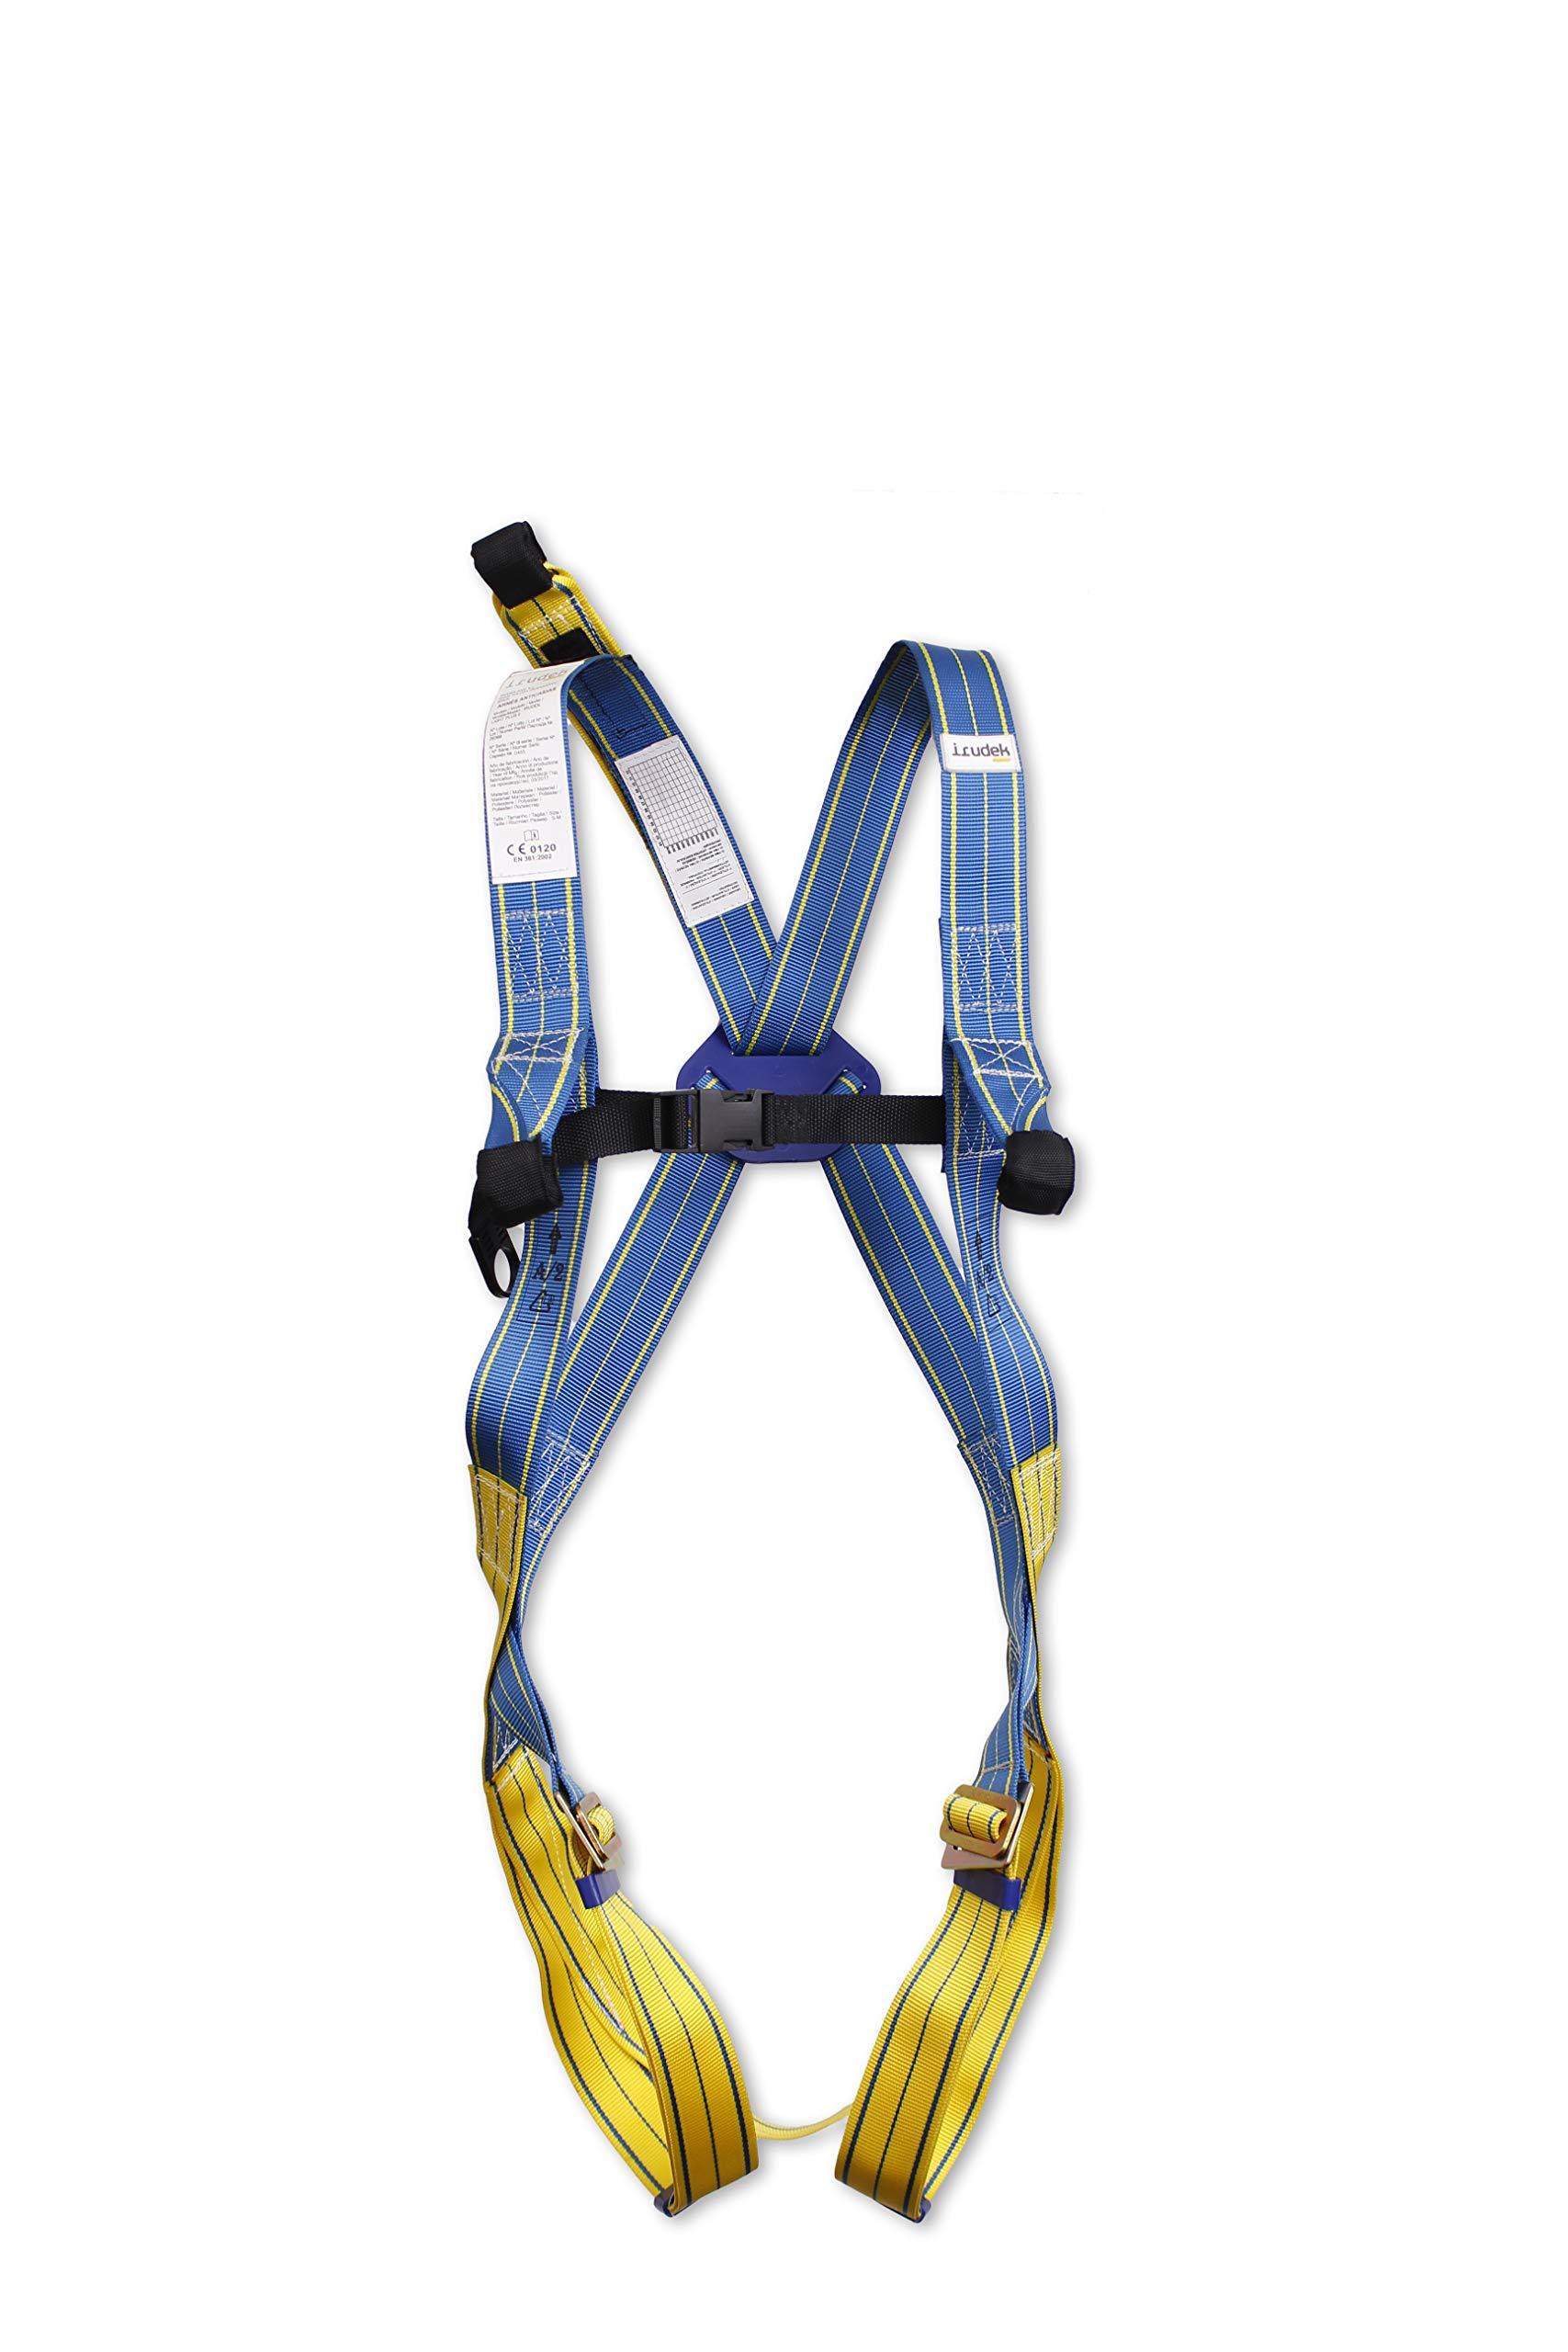 irudek Light Plus 2–Harness anticaídas